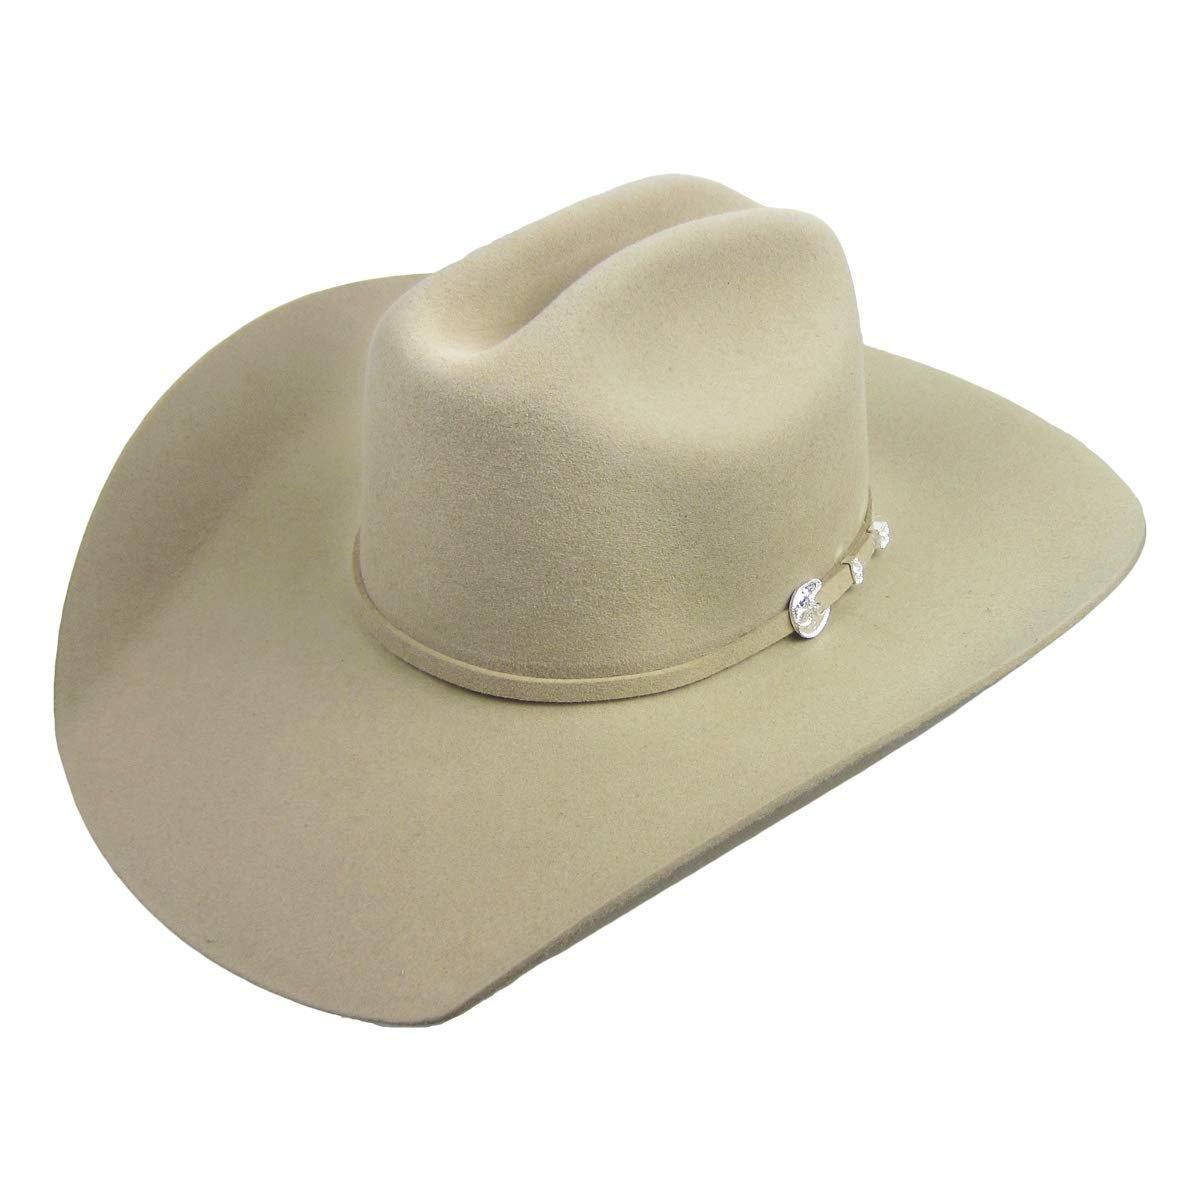 6e864d01d Details about Stetson Corral American Buffalo Collection Felt Western  Cowboy Hat